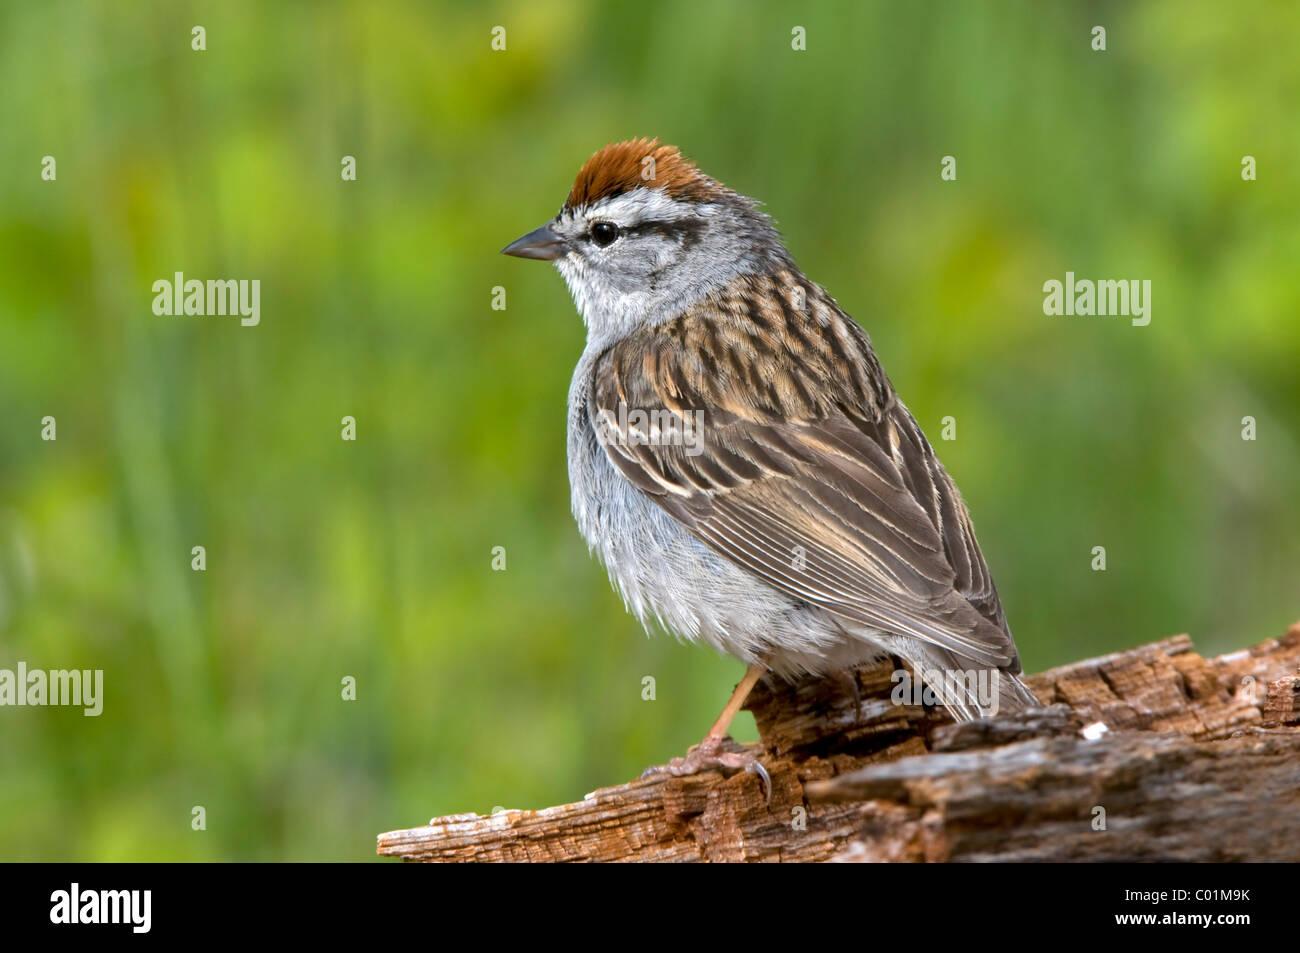 Chipping Sparrow (Spizella passerina), Yellowstone National Park, Wyoming, USA, North America - Stock Image